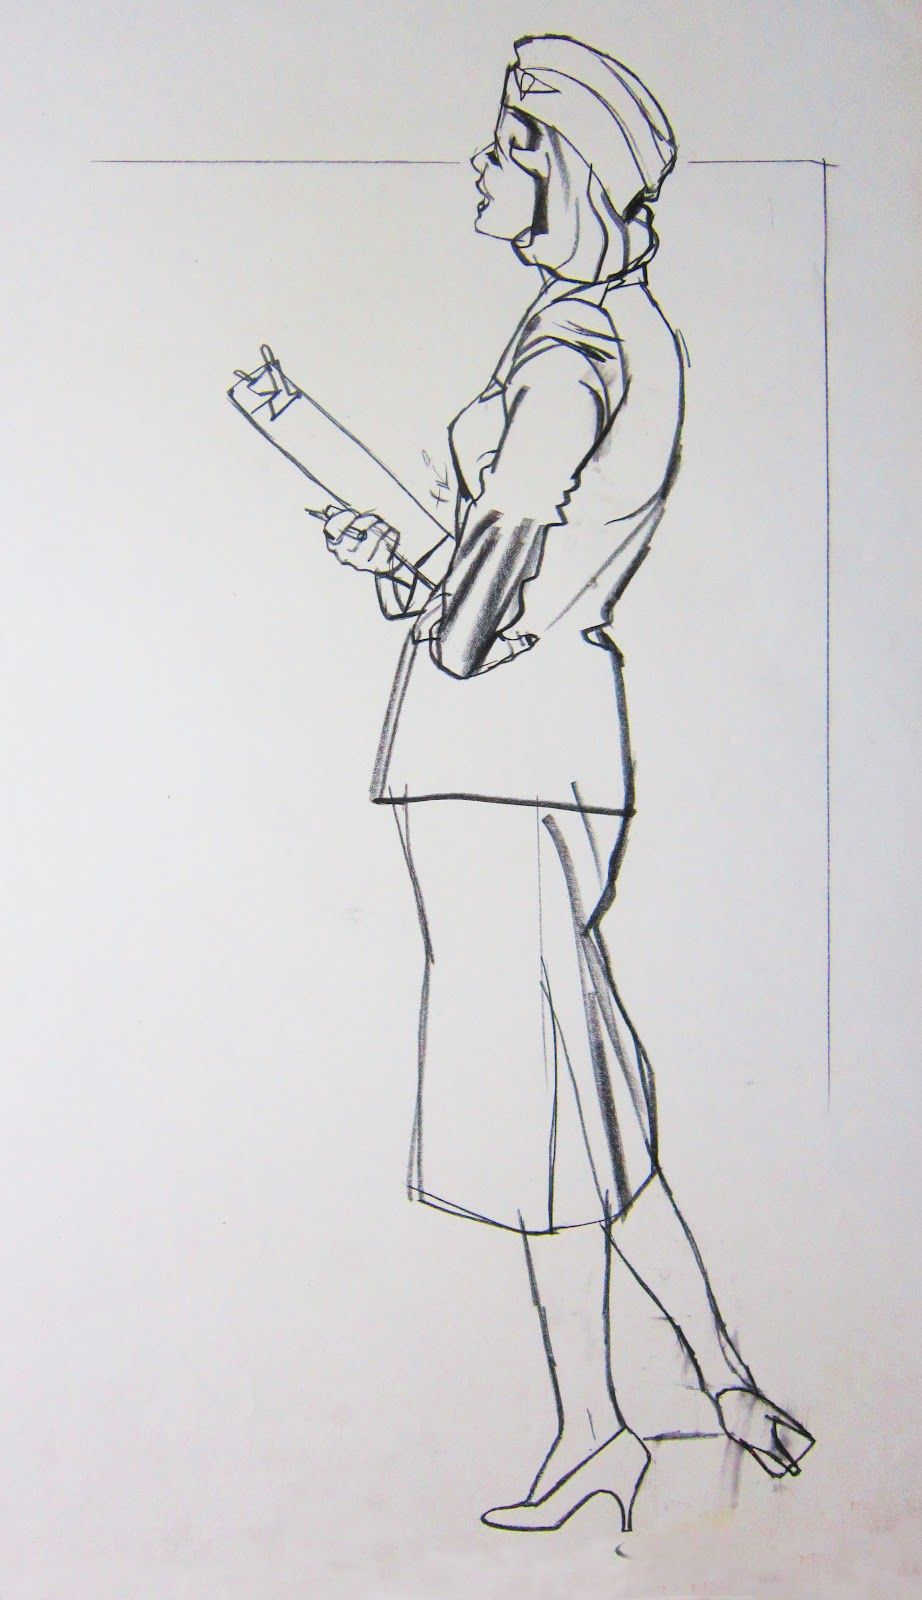 Character Design Wiki : Art by austin briggs info https en wikipedia